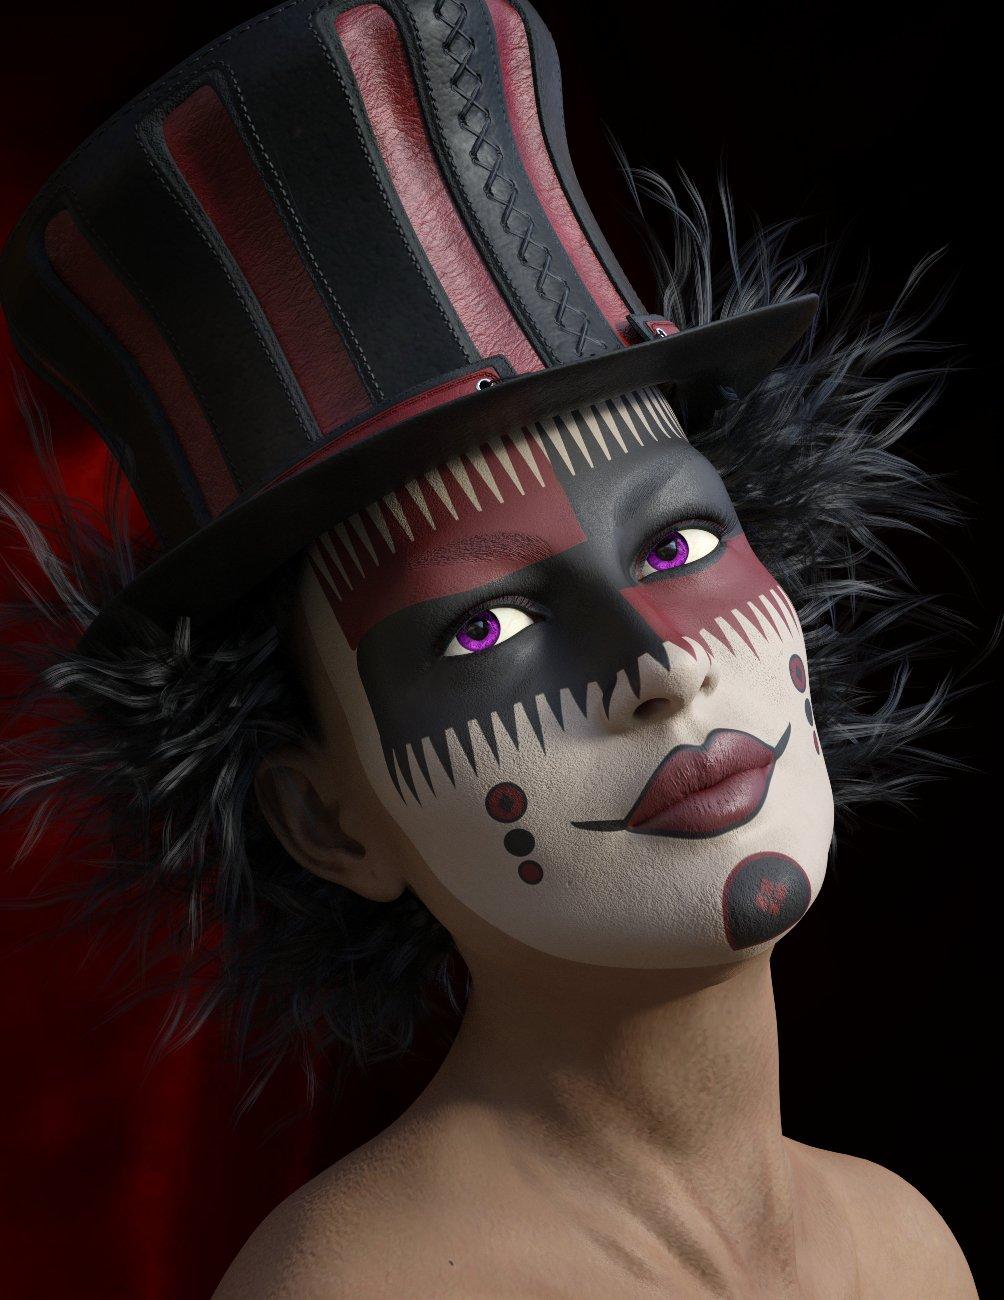 Elvira for Genesis 8 Female and Harlequin L.I.E. Make Up by: Eligo Design, 3D Models by Daz 3D